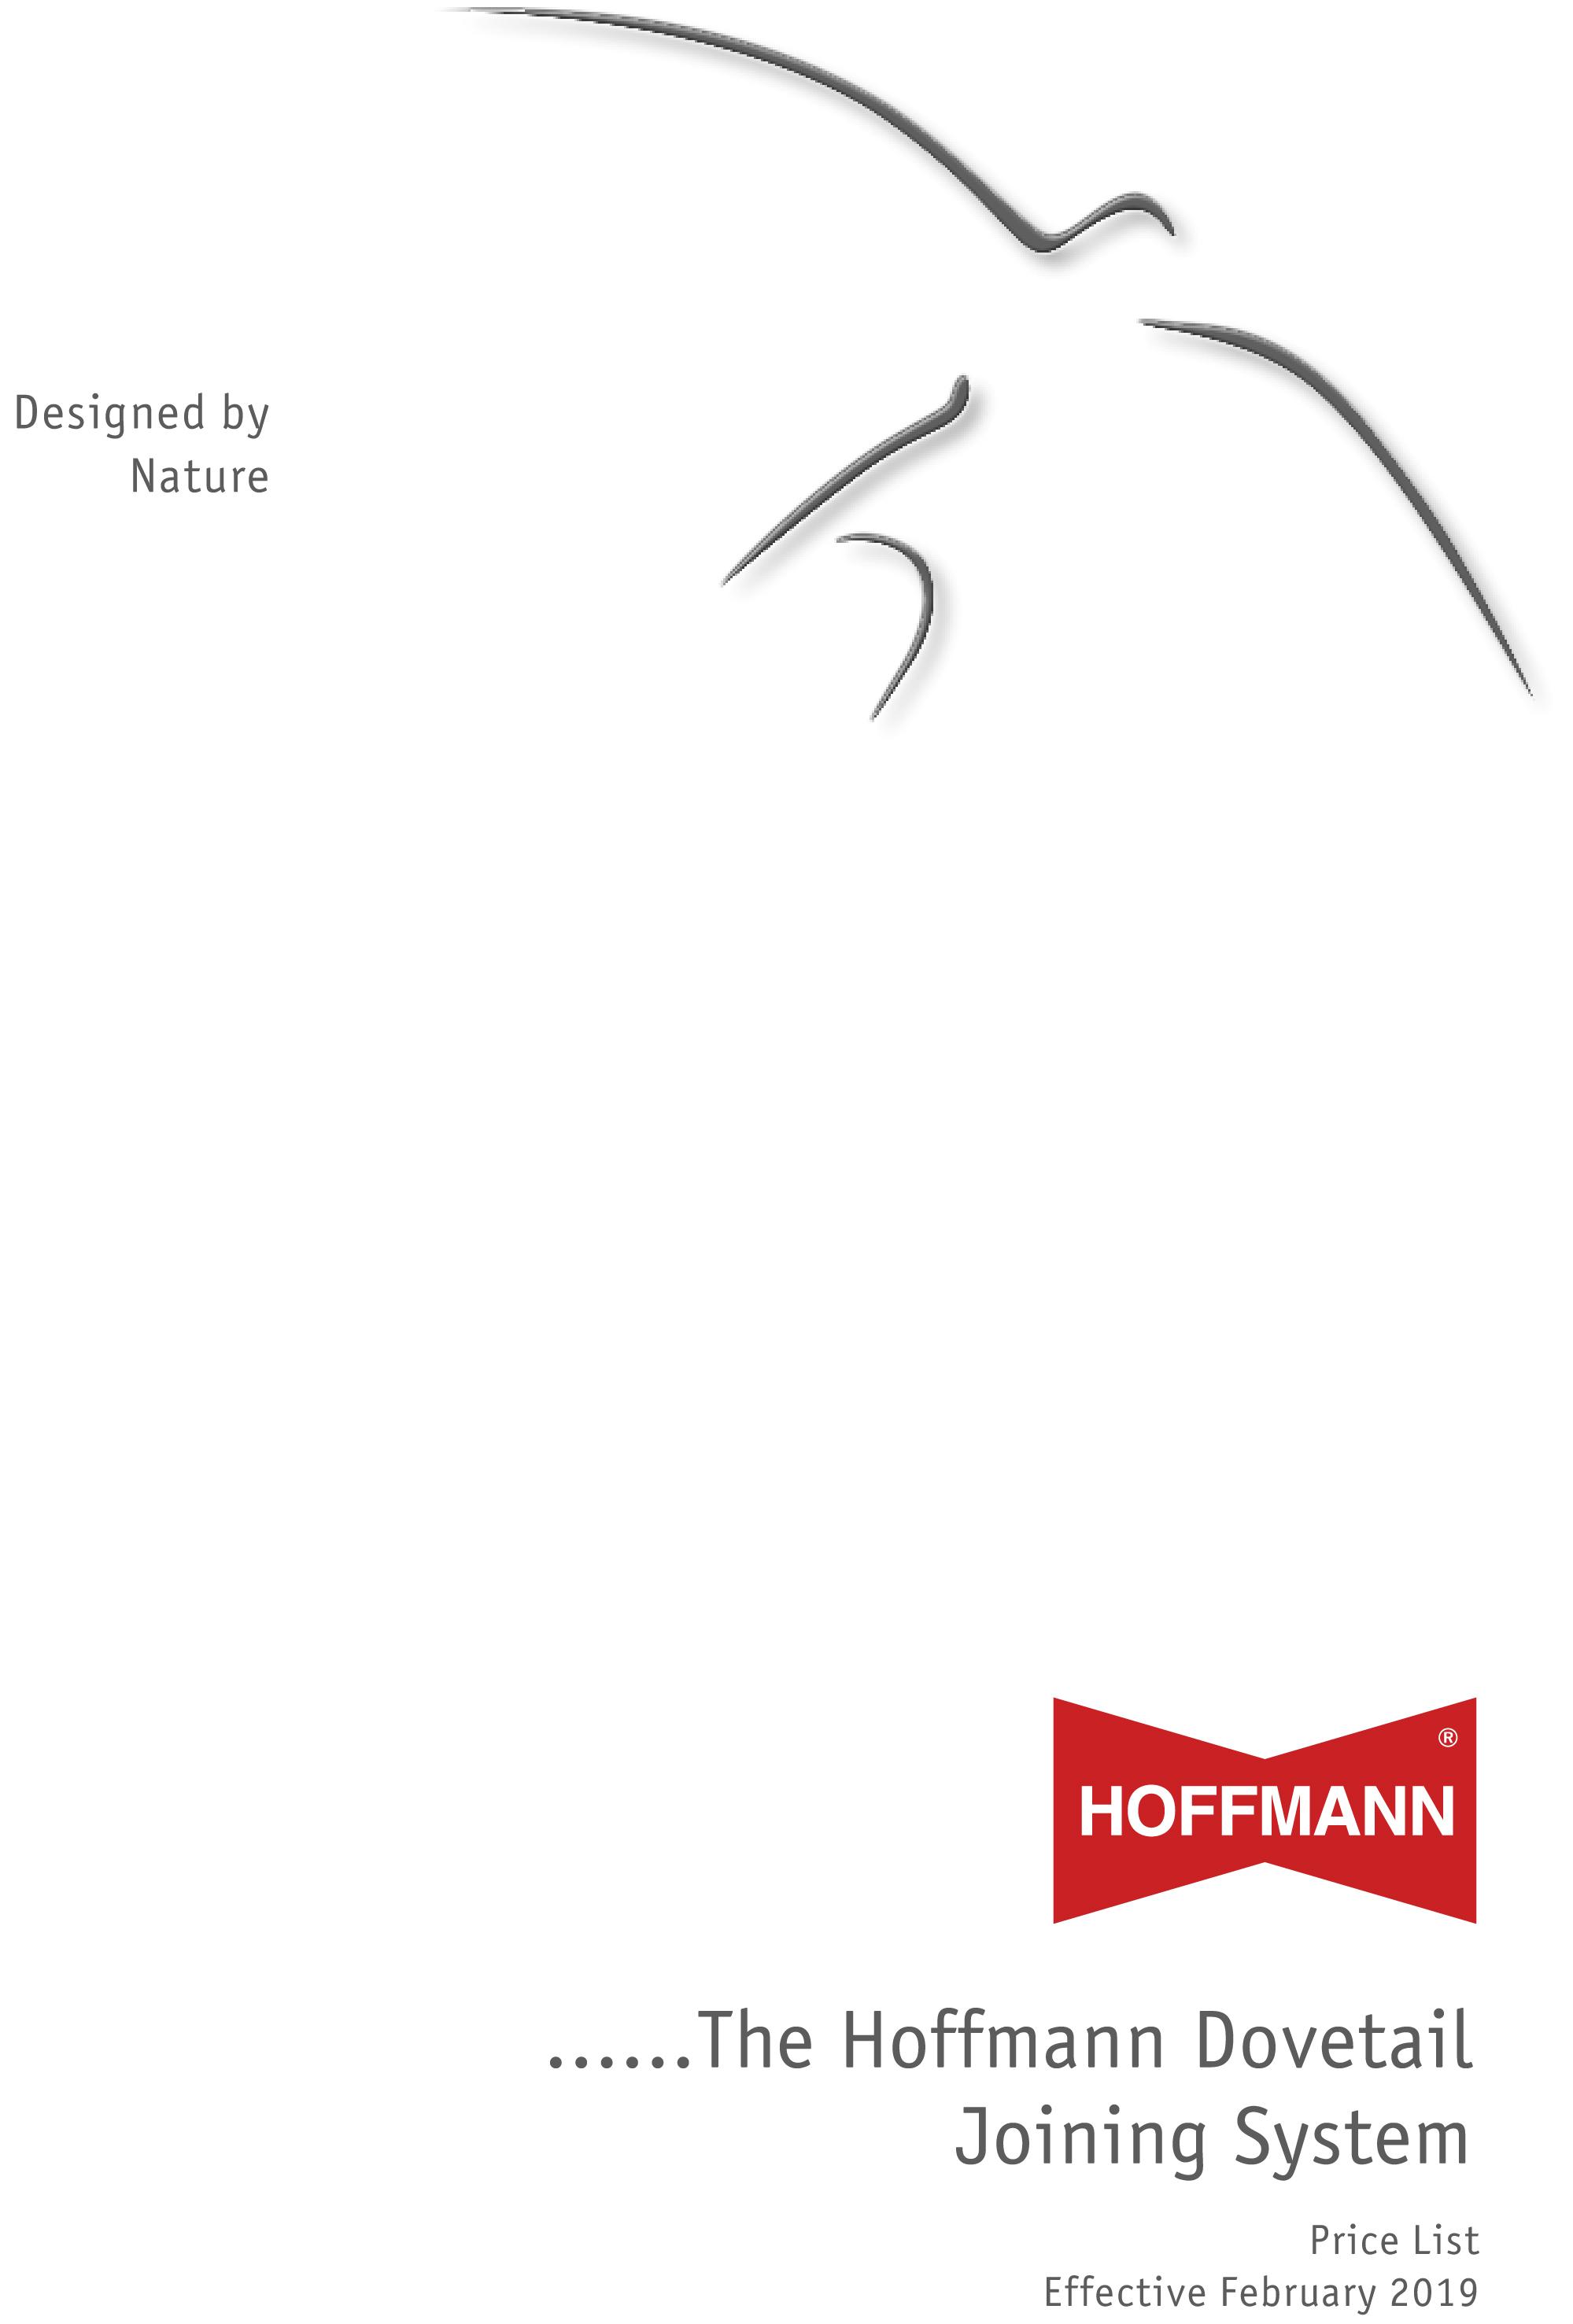 hoffmann-price-list-eff.jpg